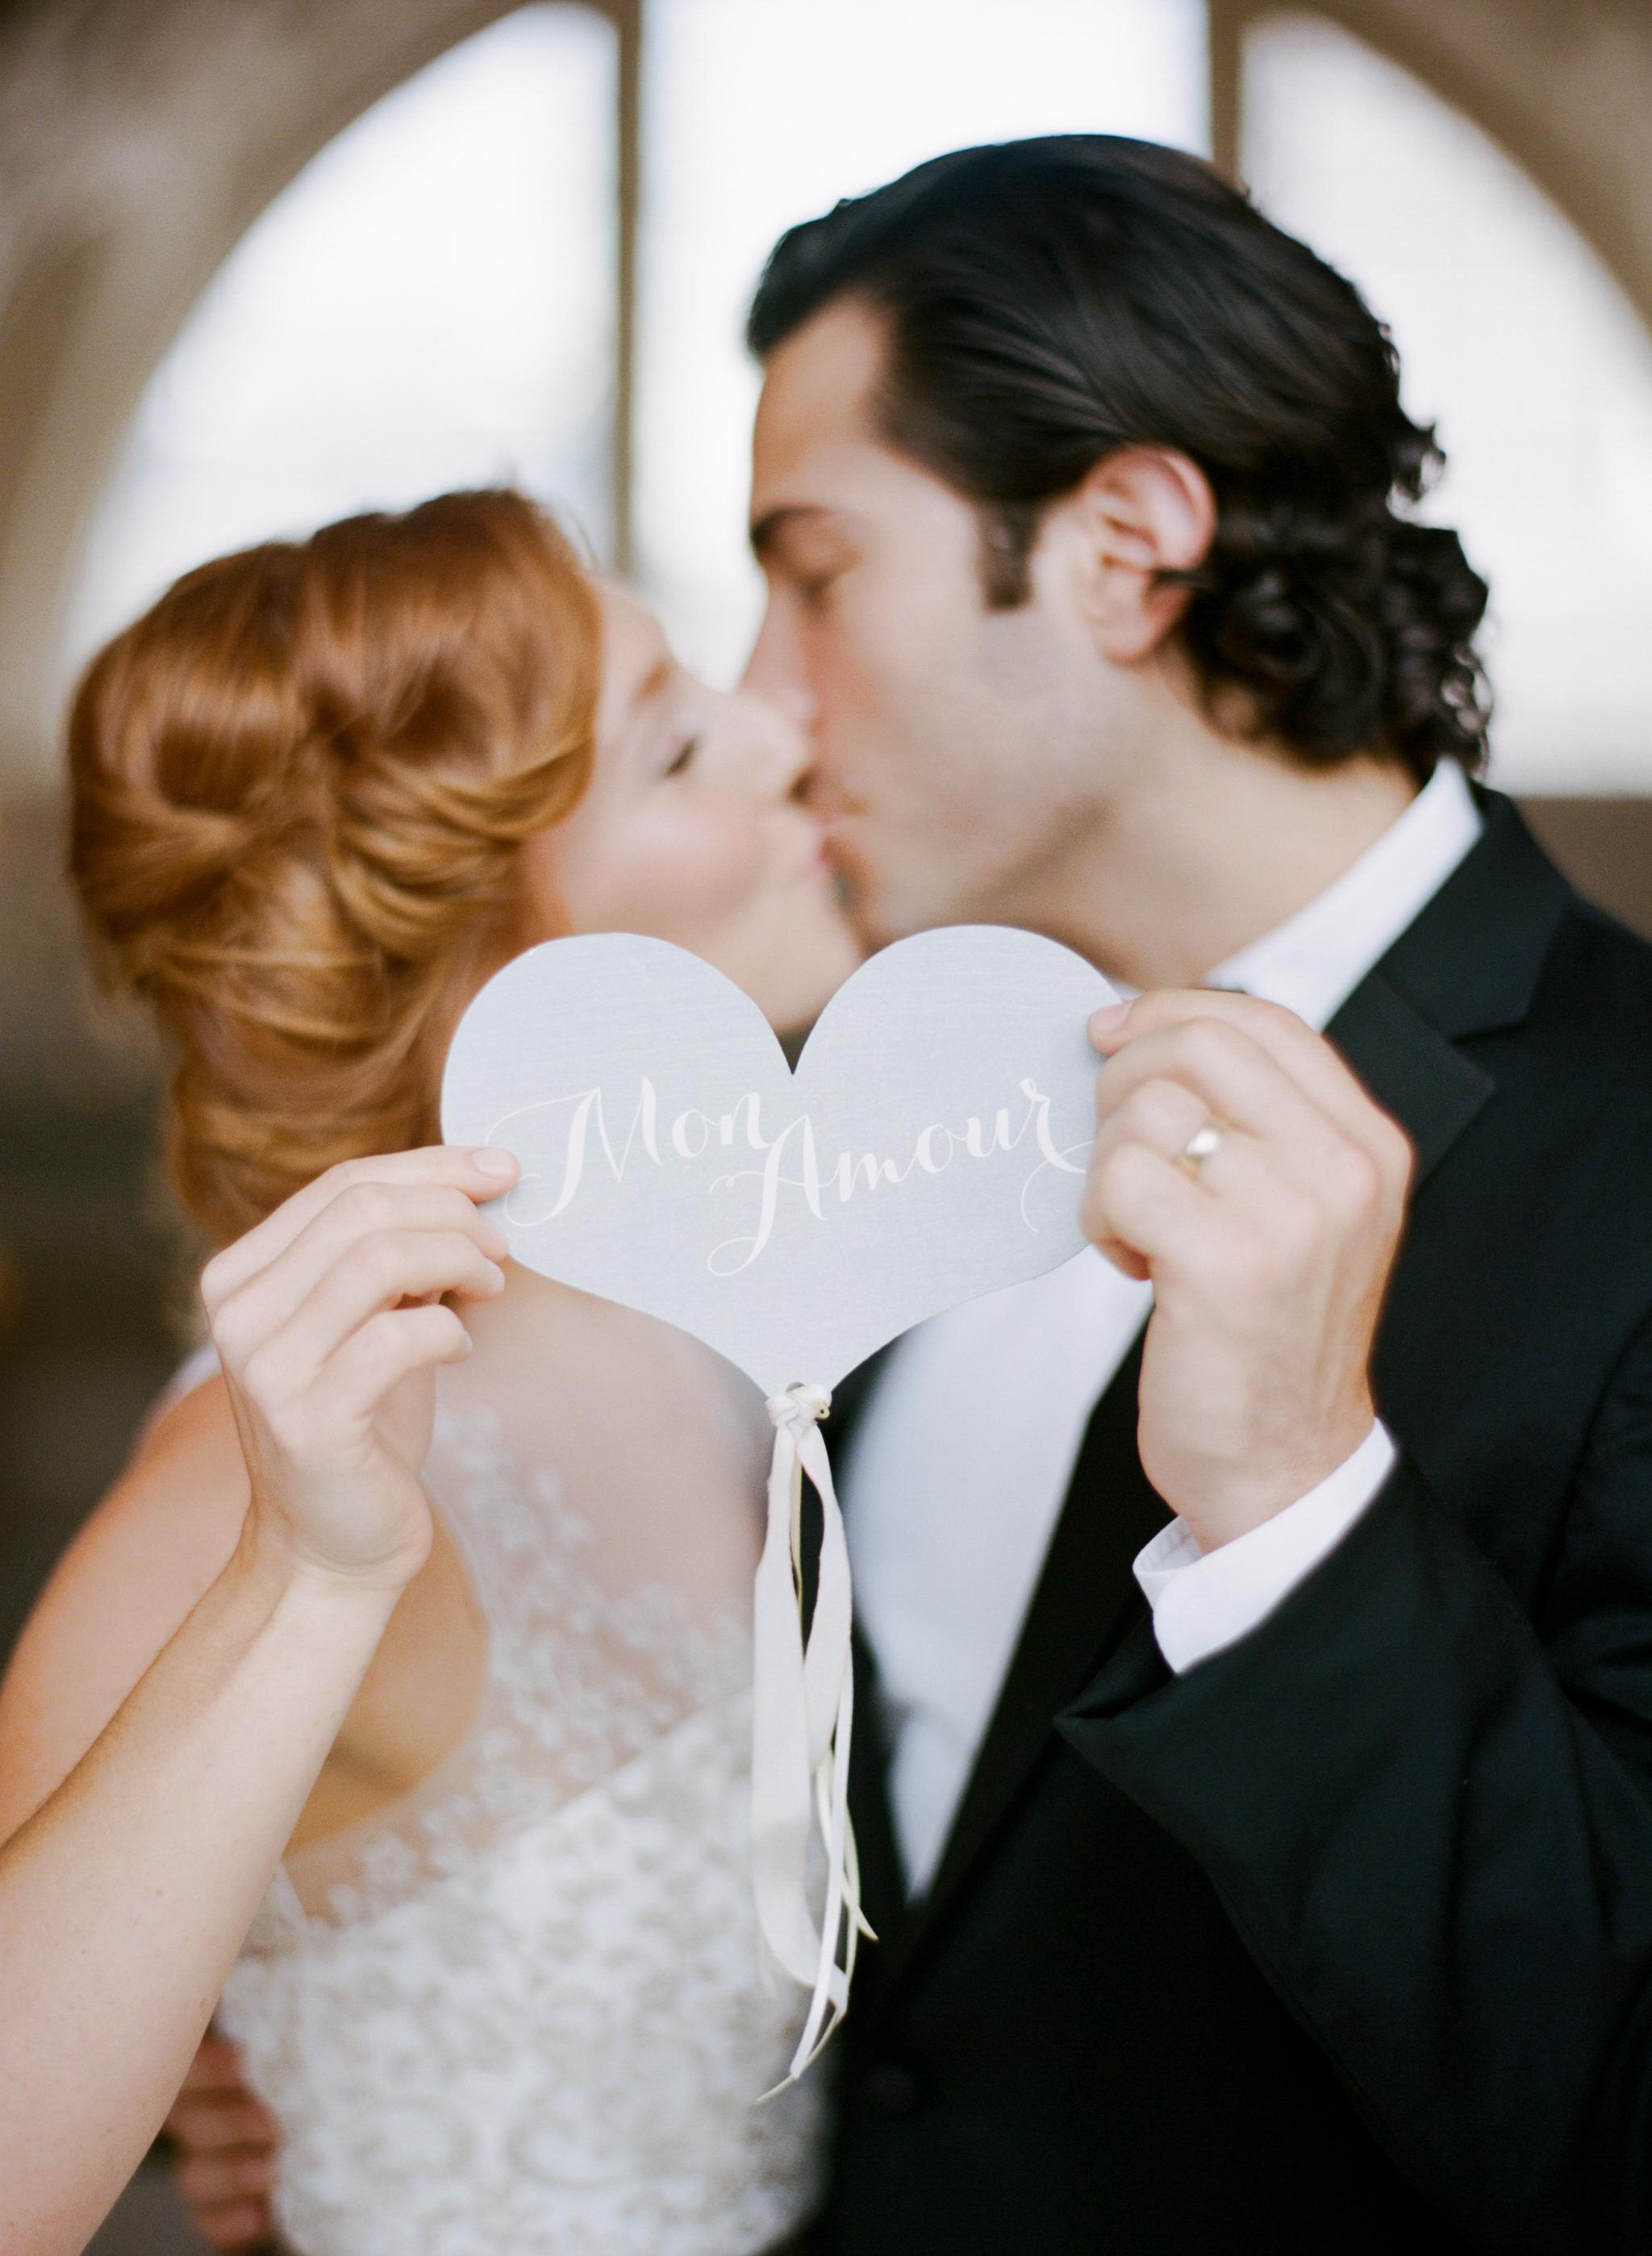 006-80830010SylvieGil-Paris-macaroons-red hair bride-romantic wedding-french wedding.jpg